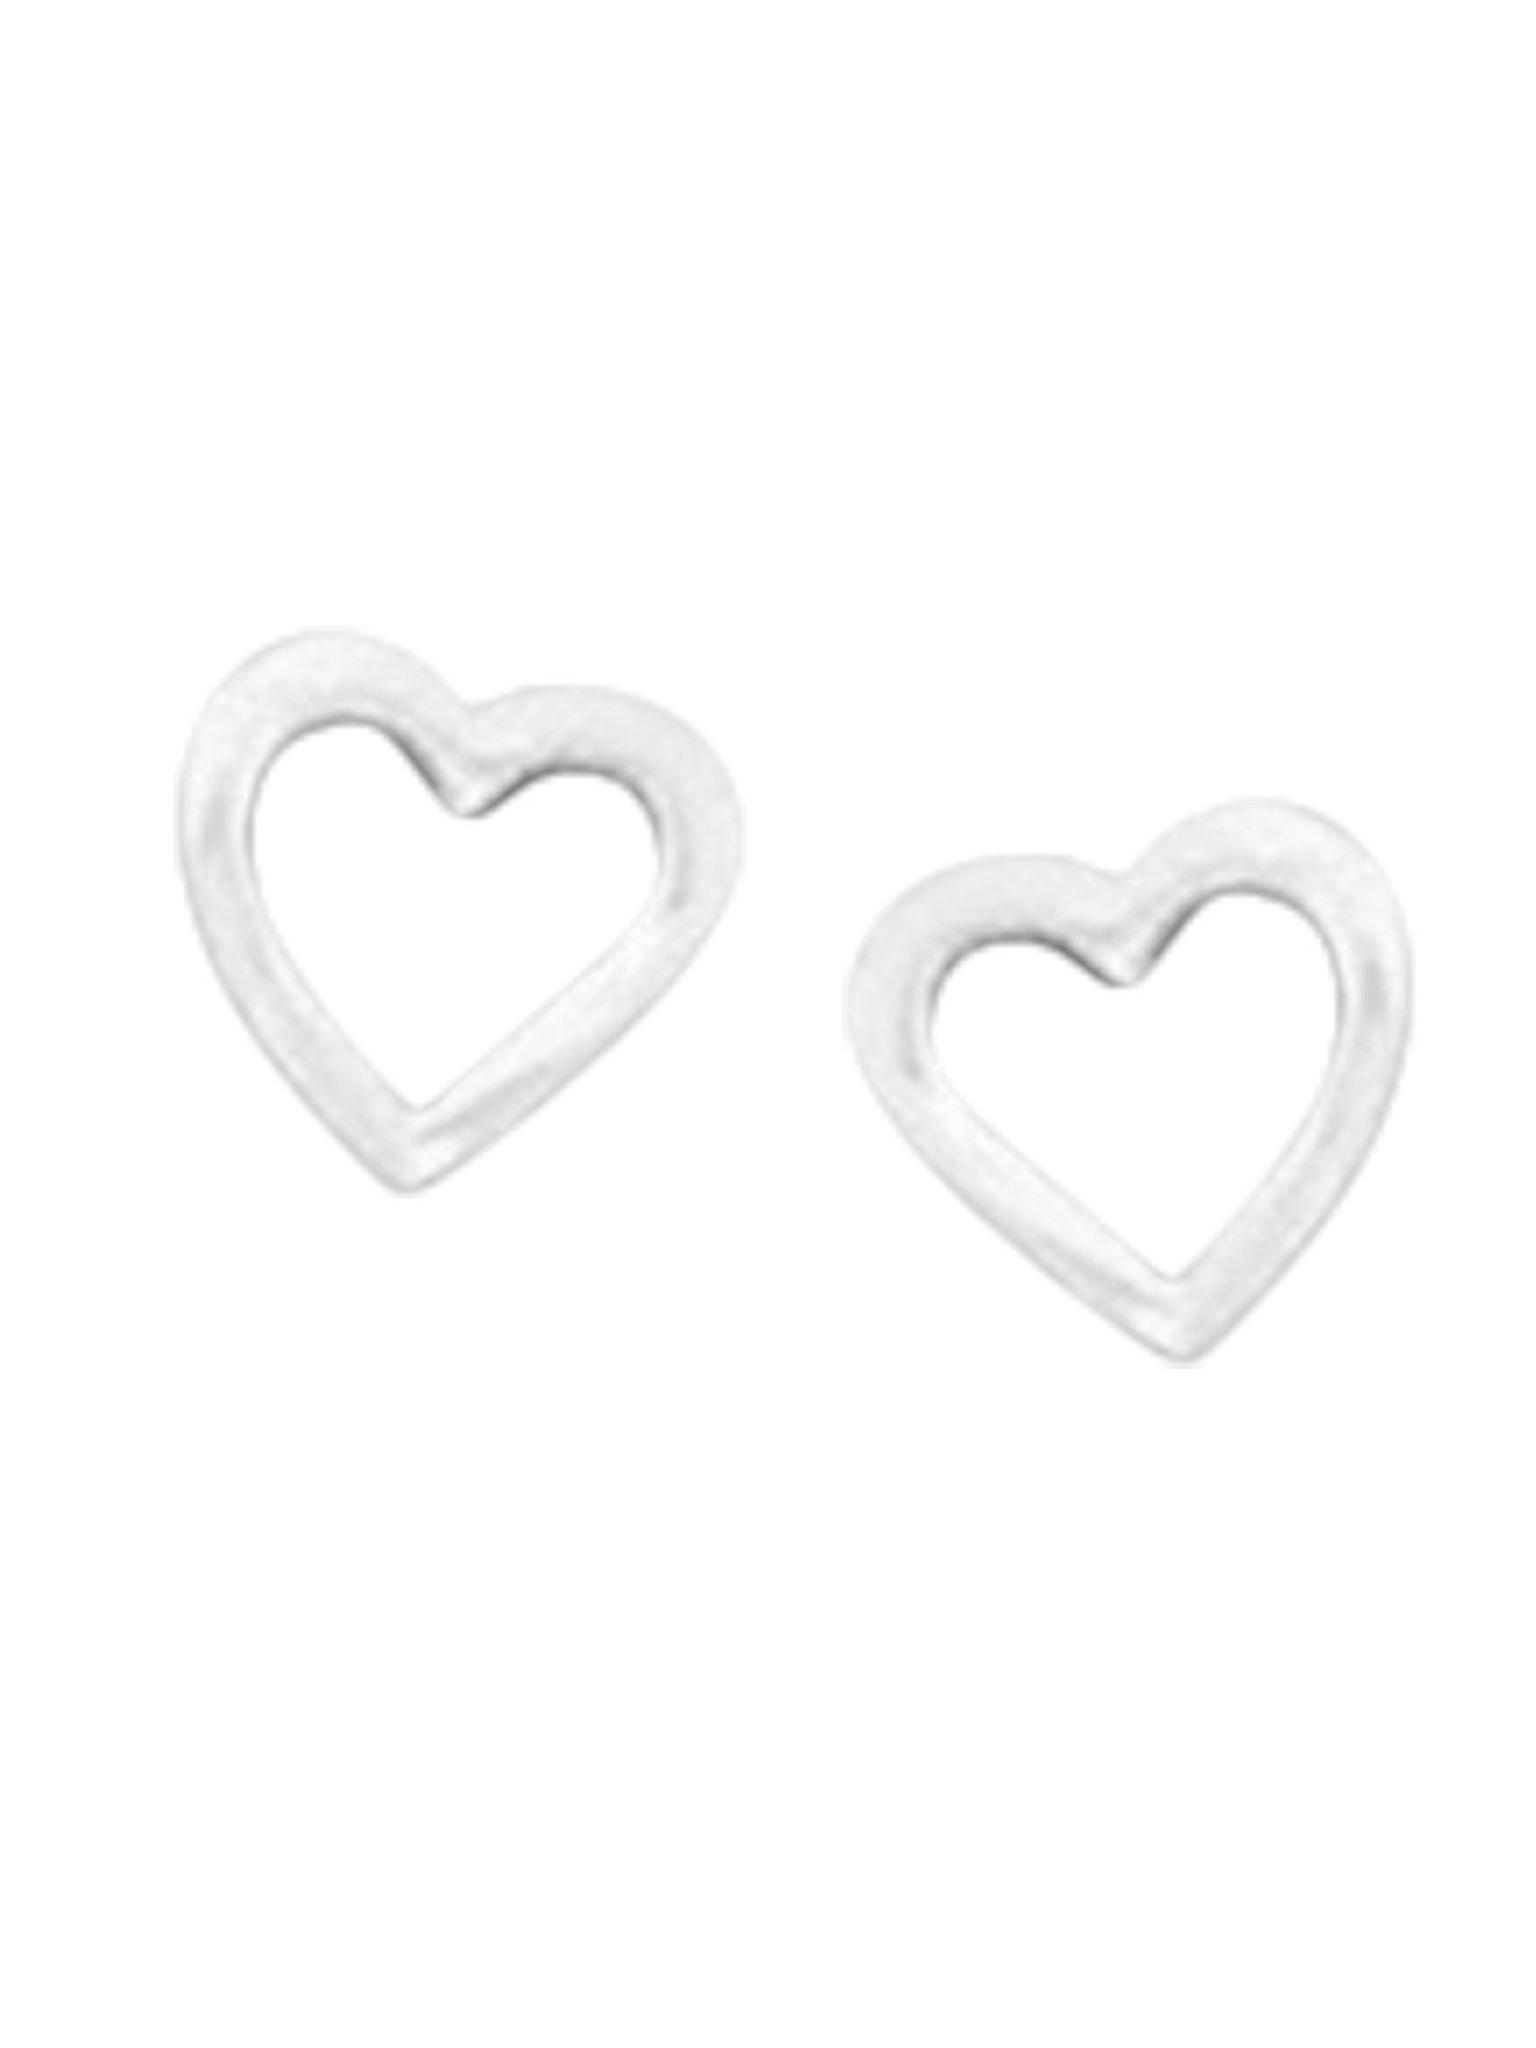 Acomo Jewelry Heart Outline Stud Earring